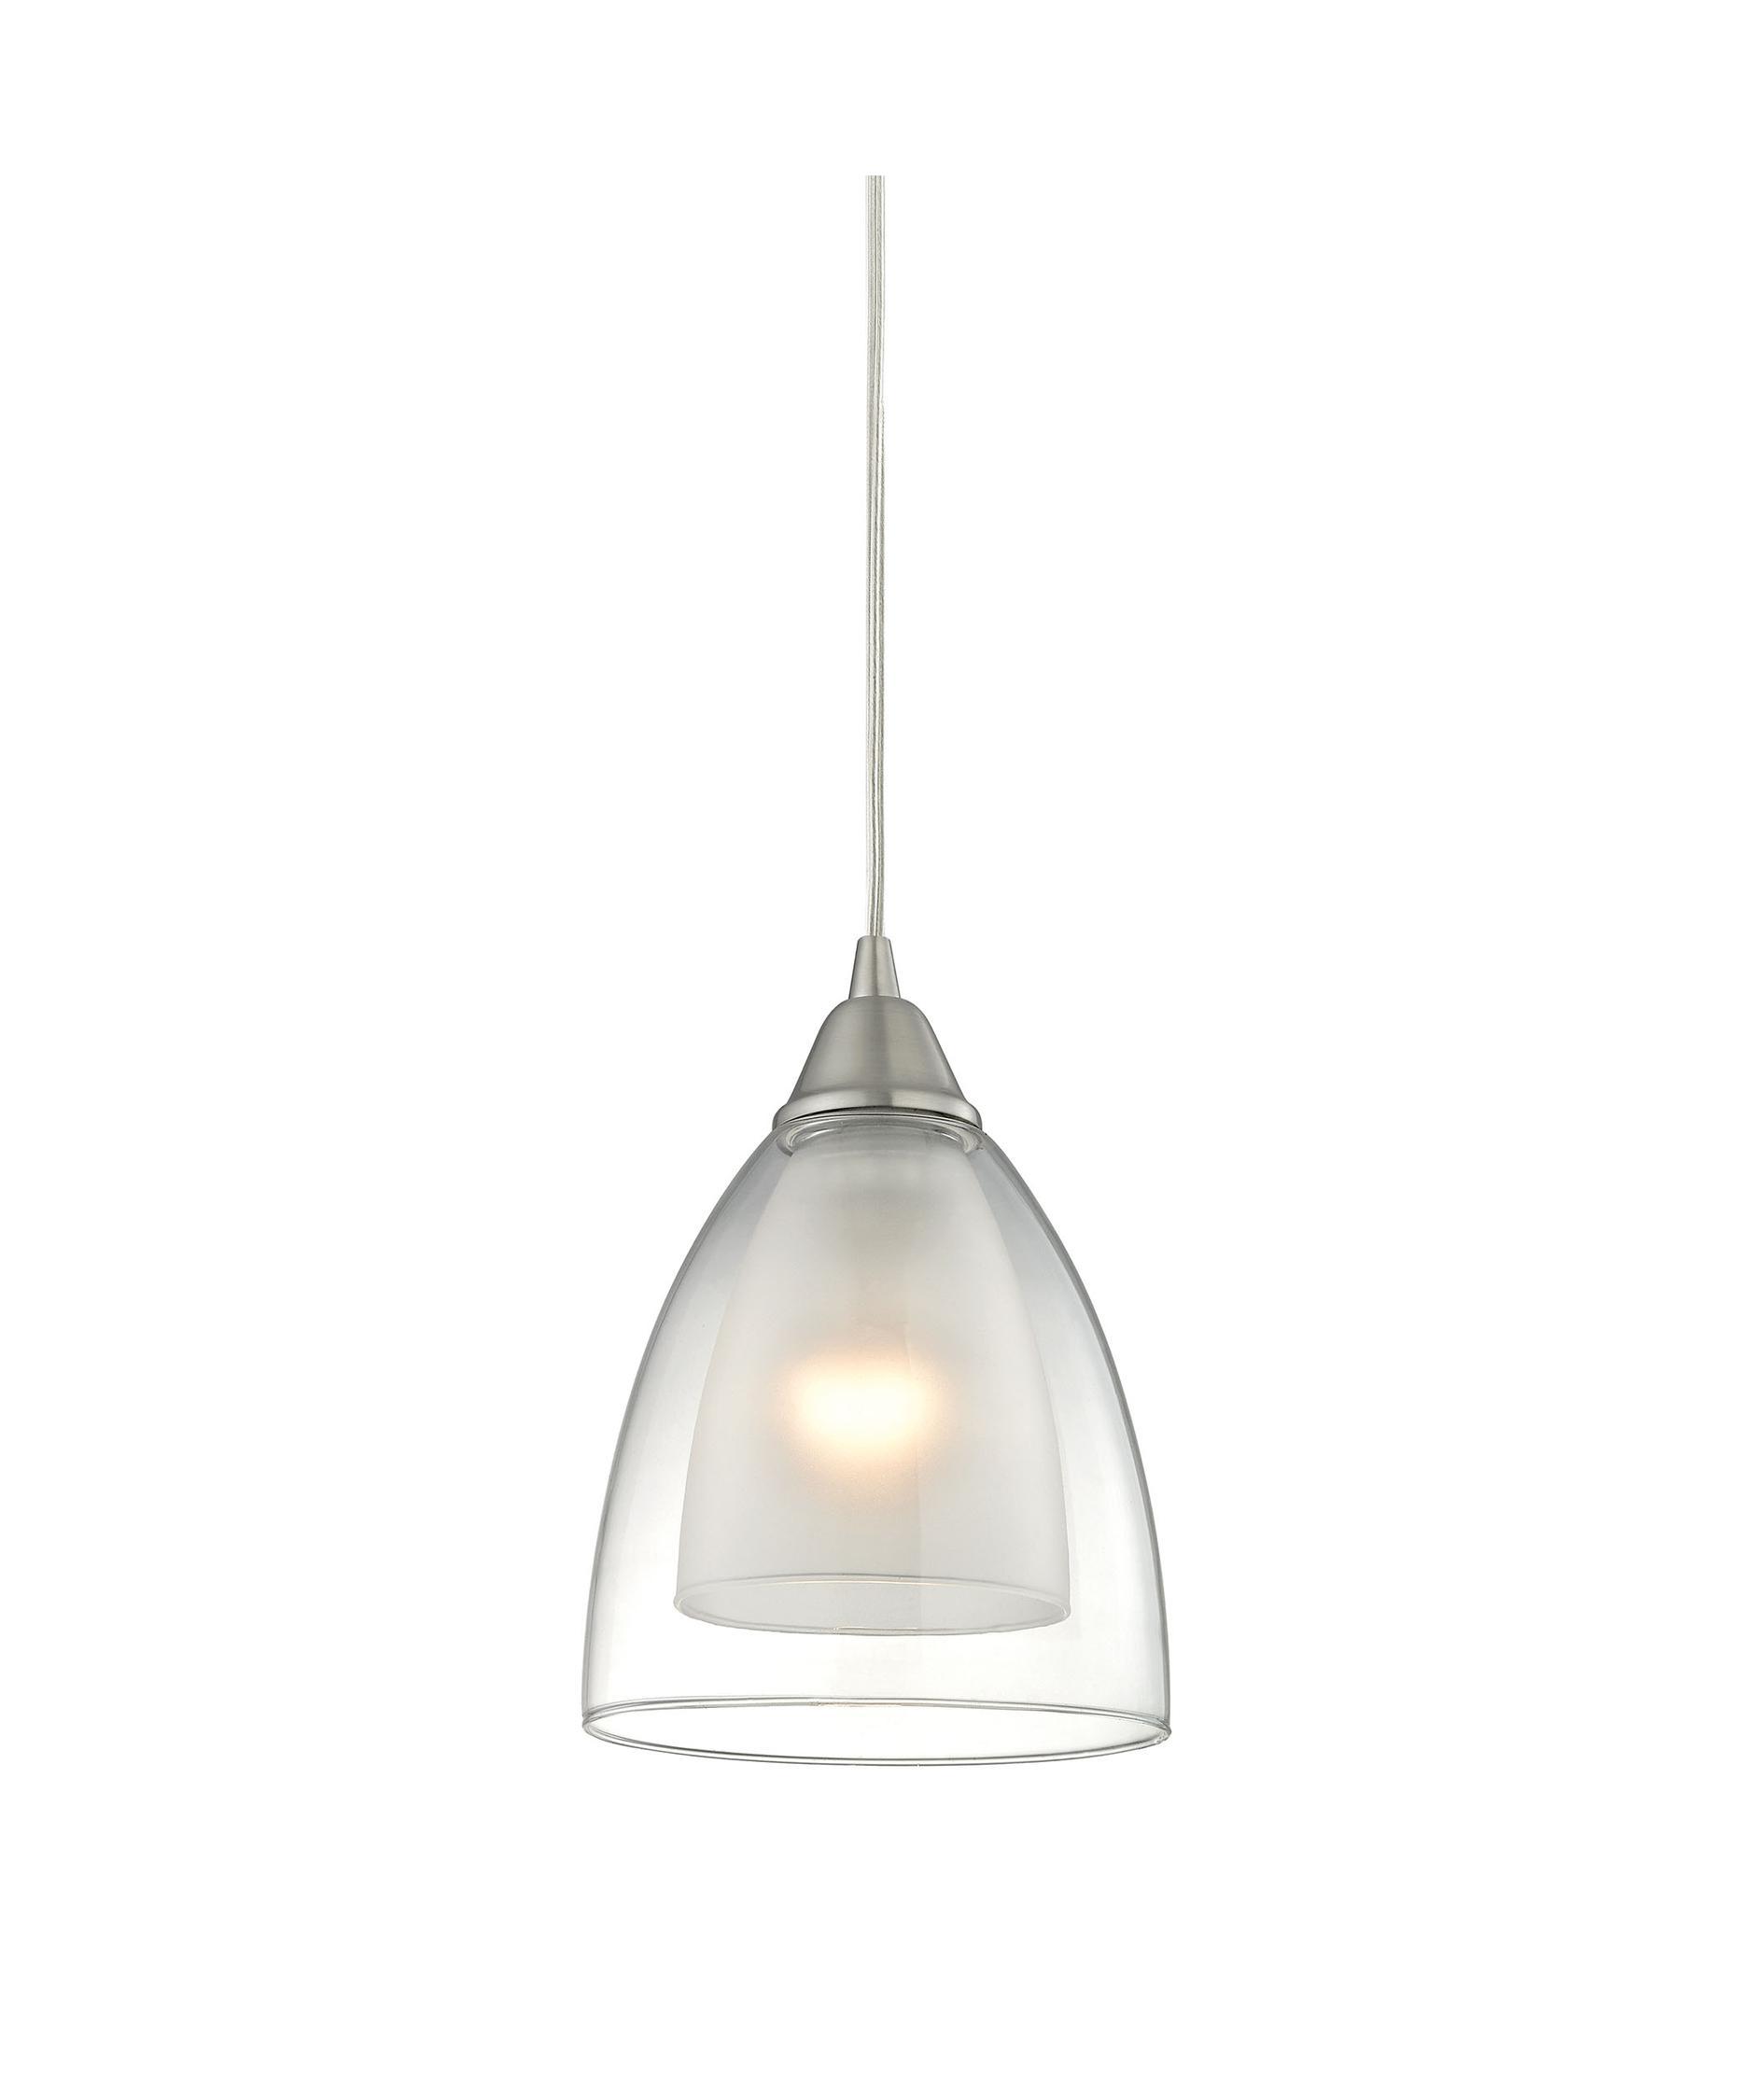 Elk Lighting 10464 1 Layers 6 Inch Wide 1 Light Mini Pendant Capitol Lighting 1 800lighting Com